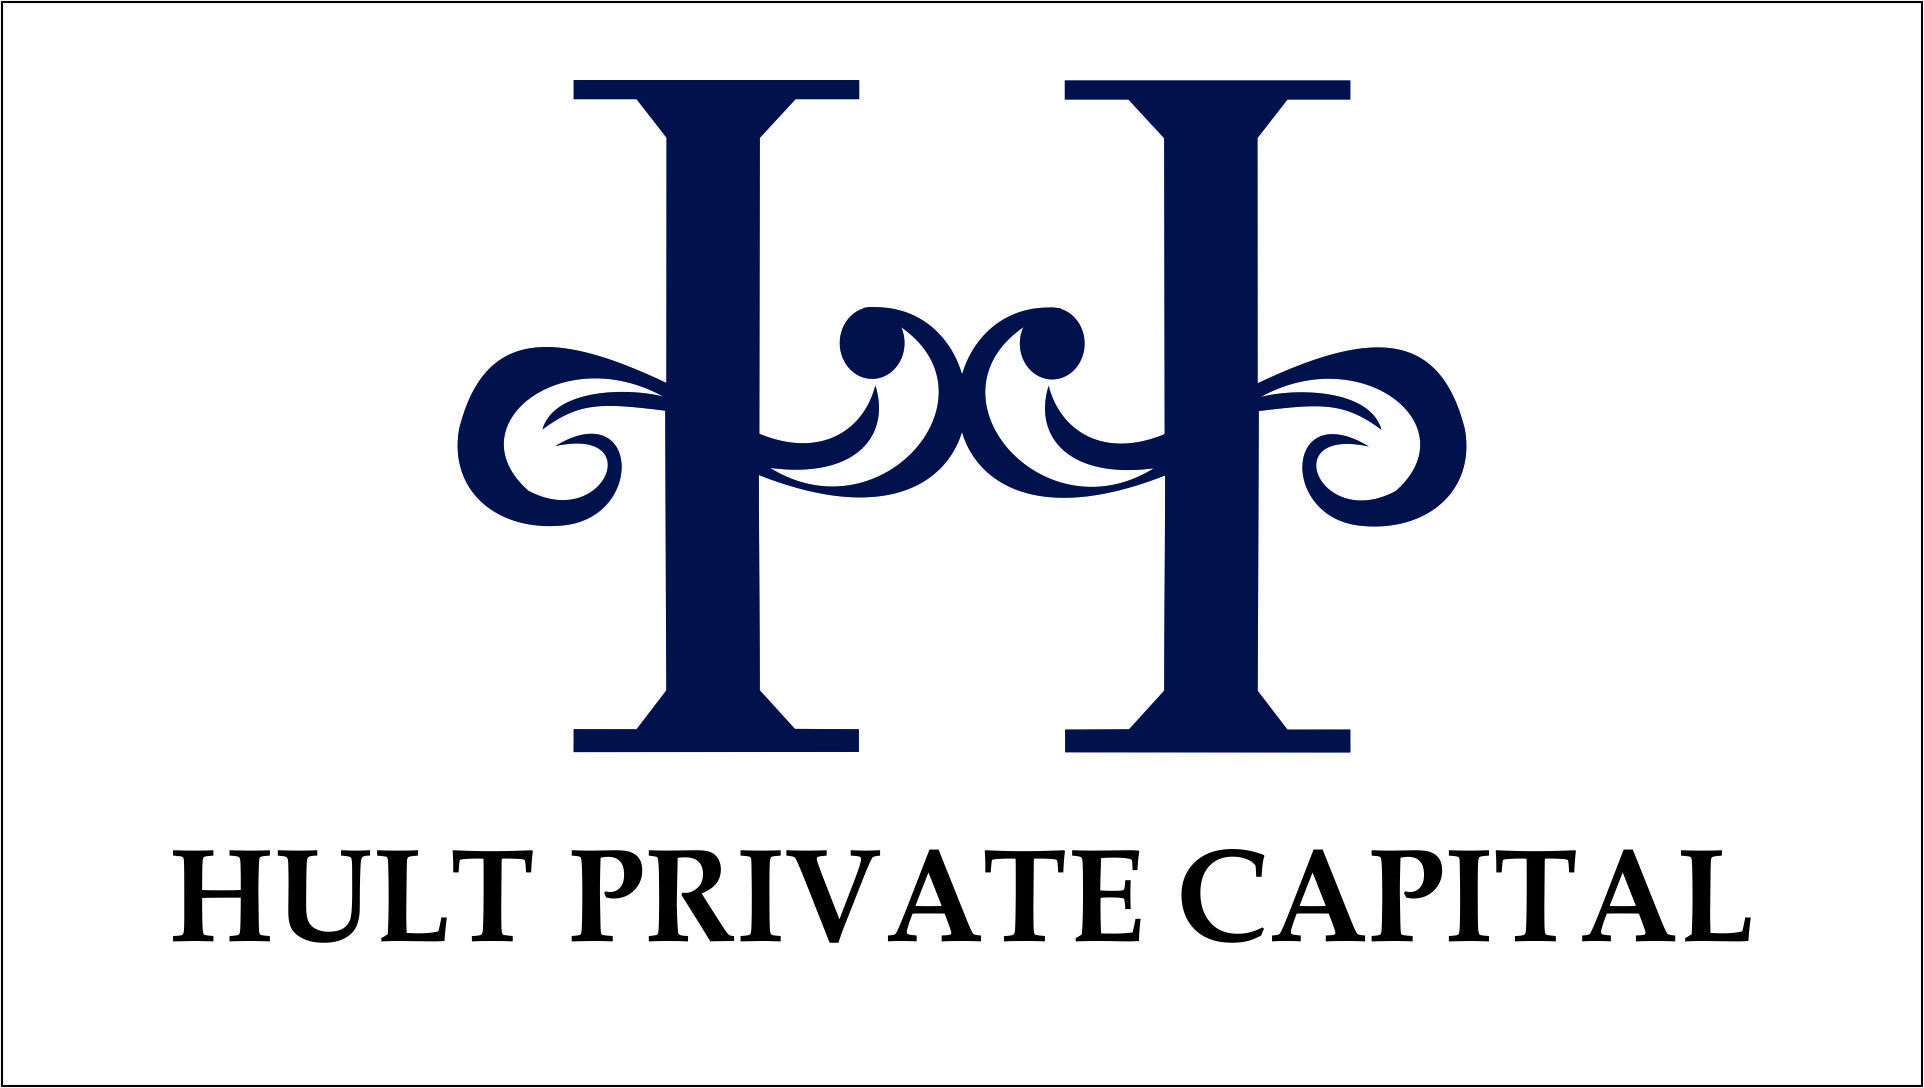 HULT PRIVATE CAPITAL.jpg